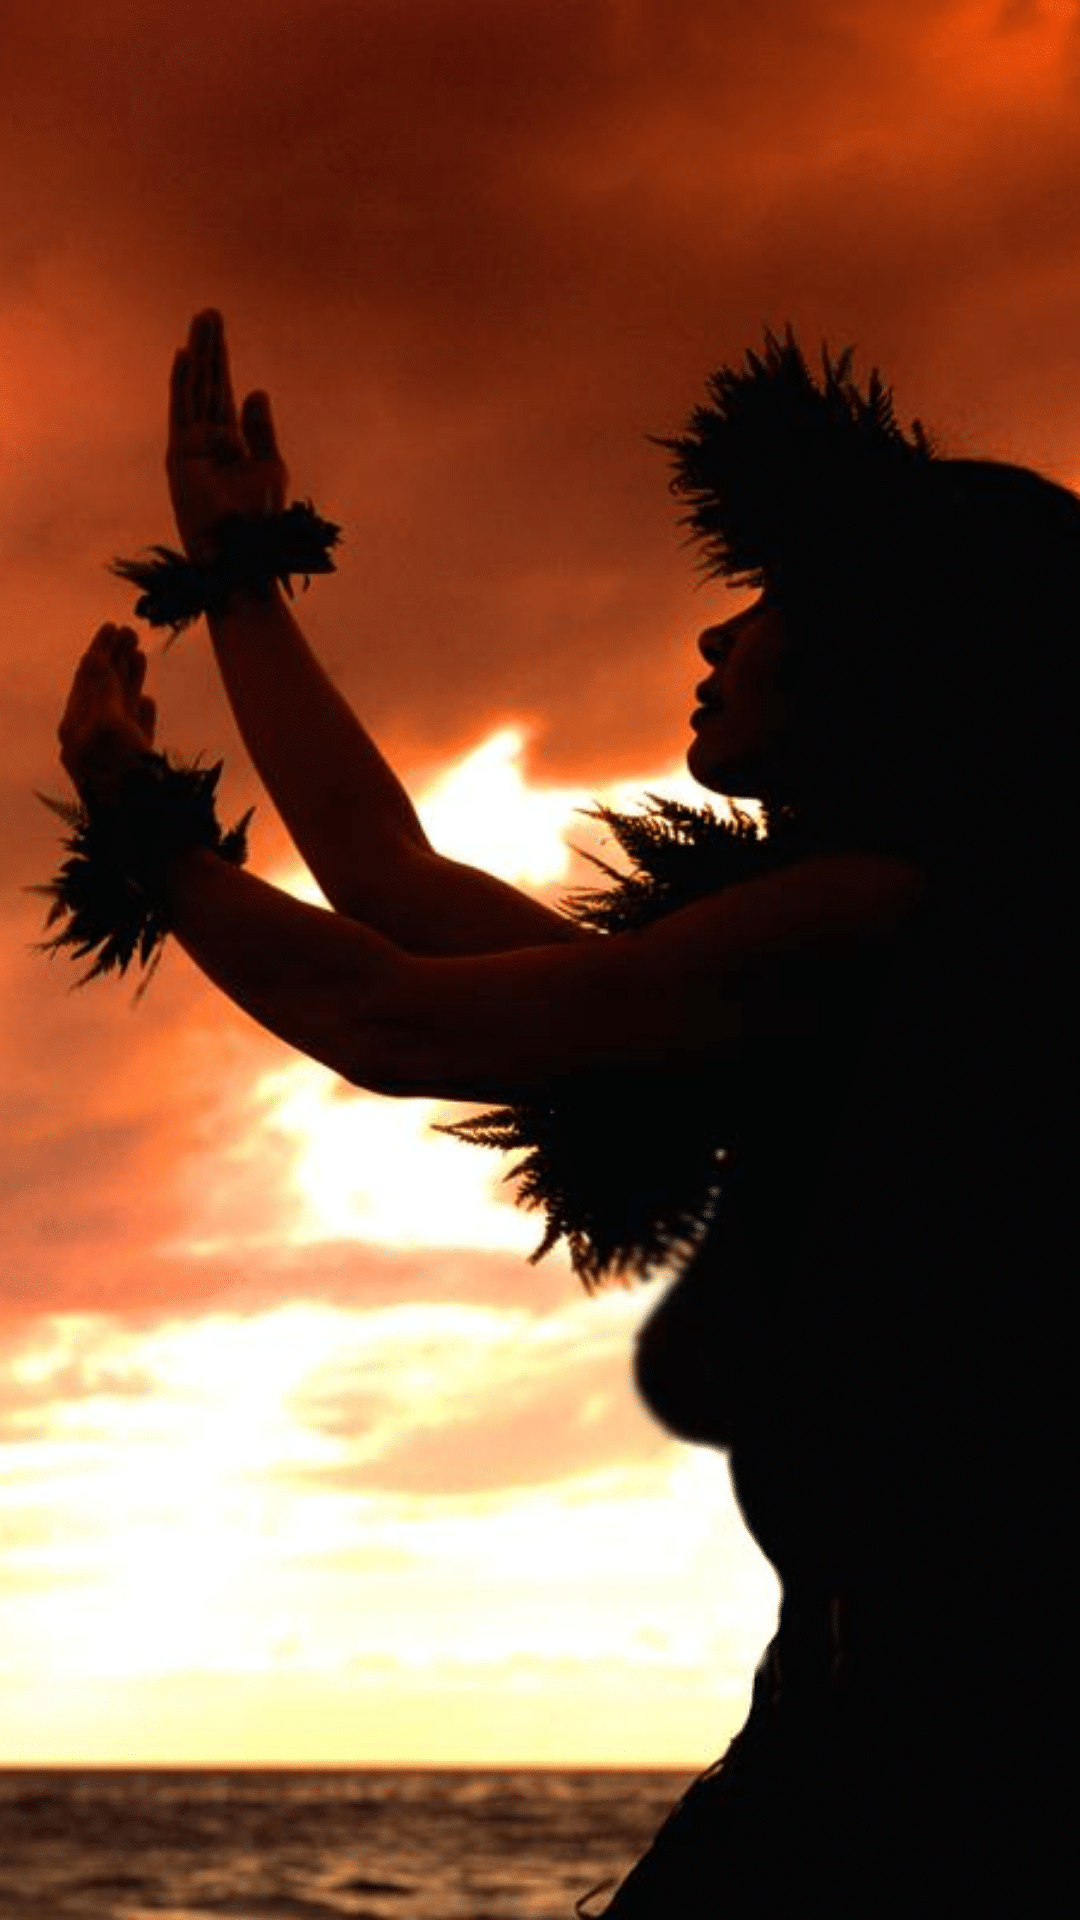 Young woman dances the hula at sunset